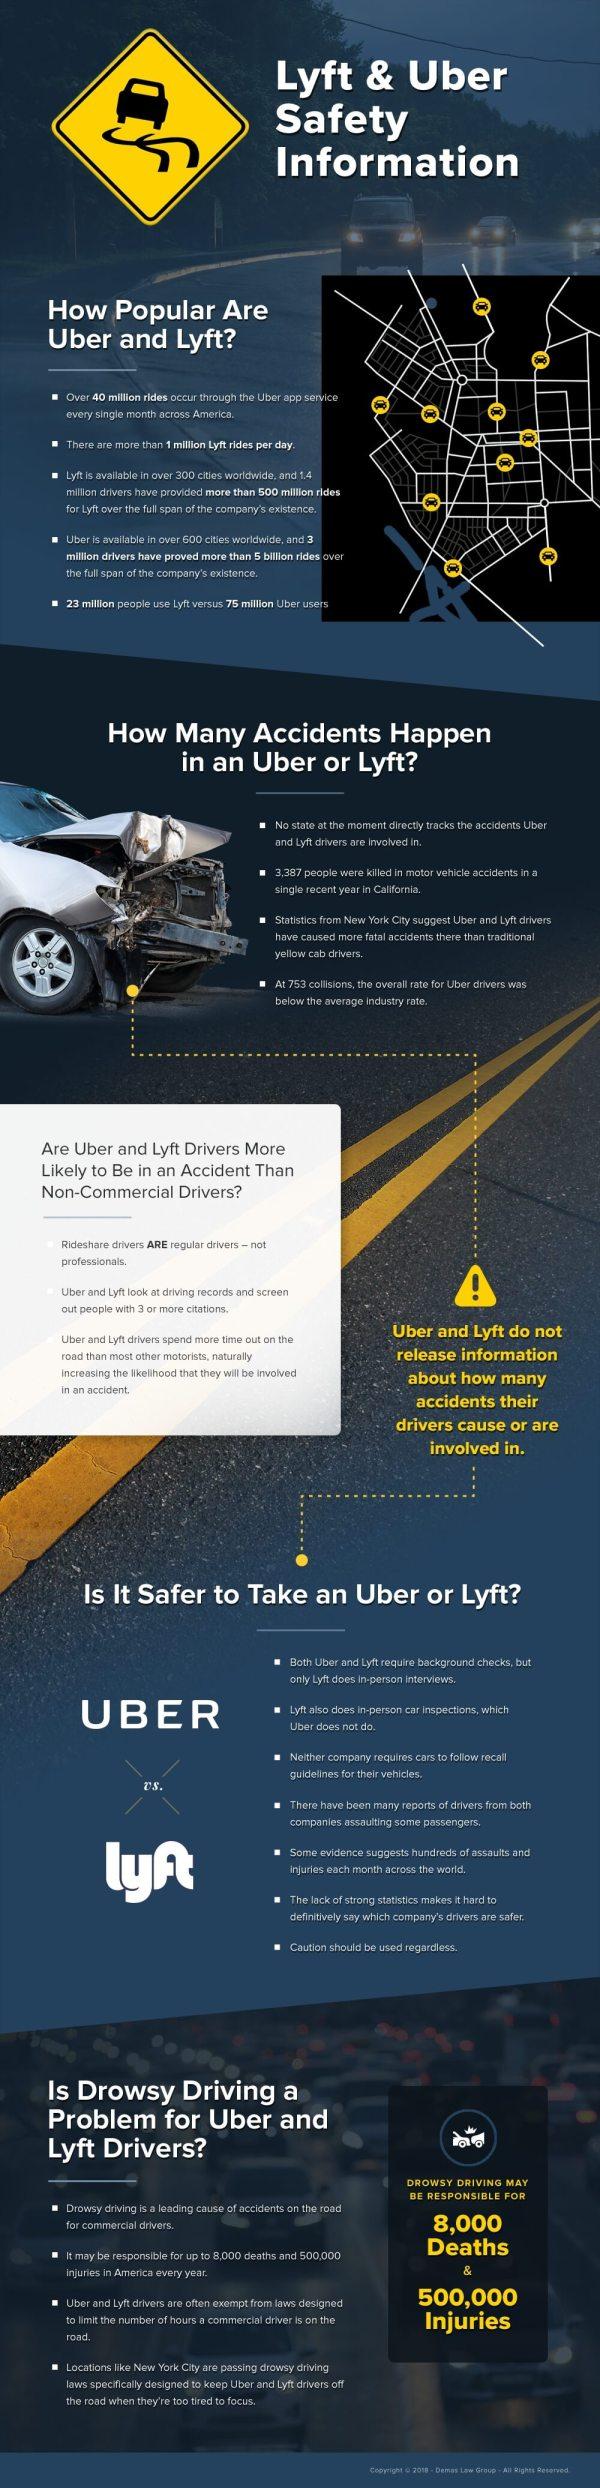 Ride Share Infographic - Demas (1)